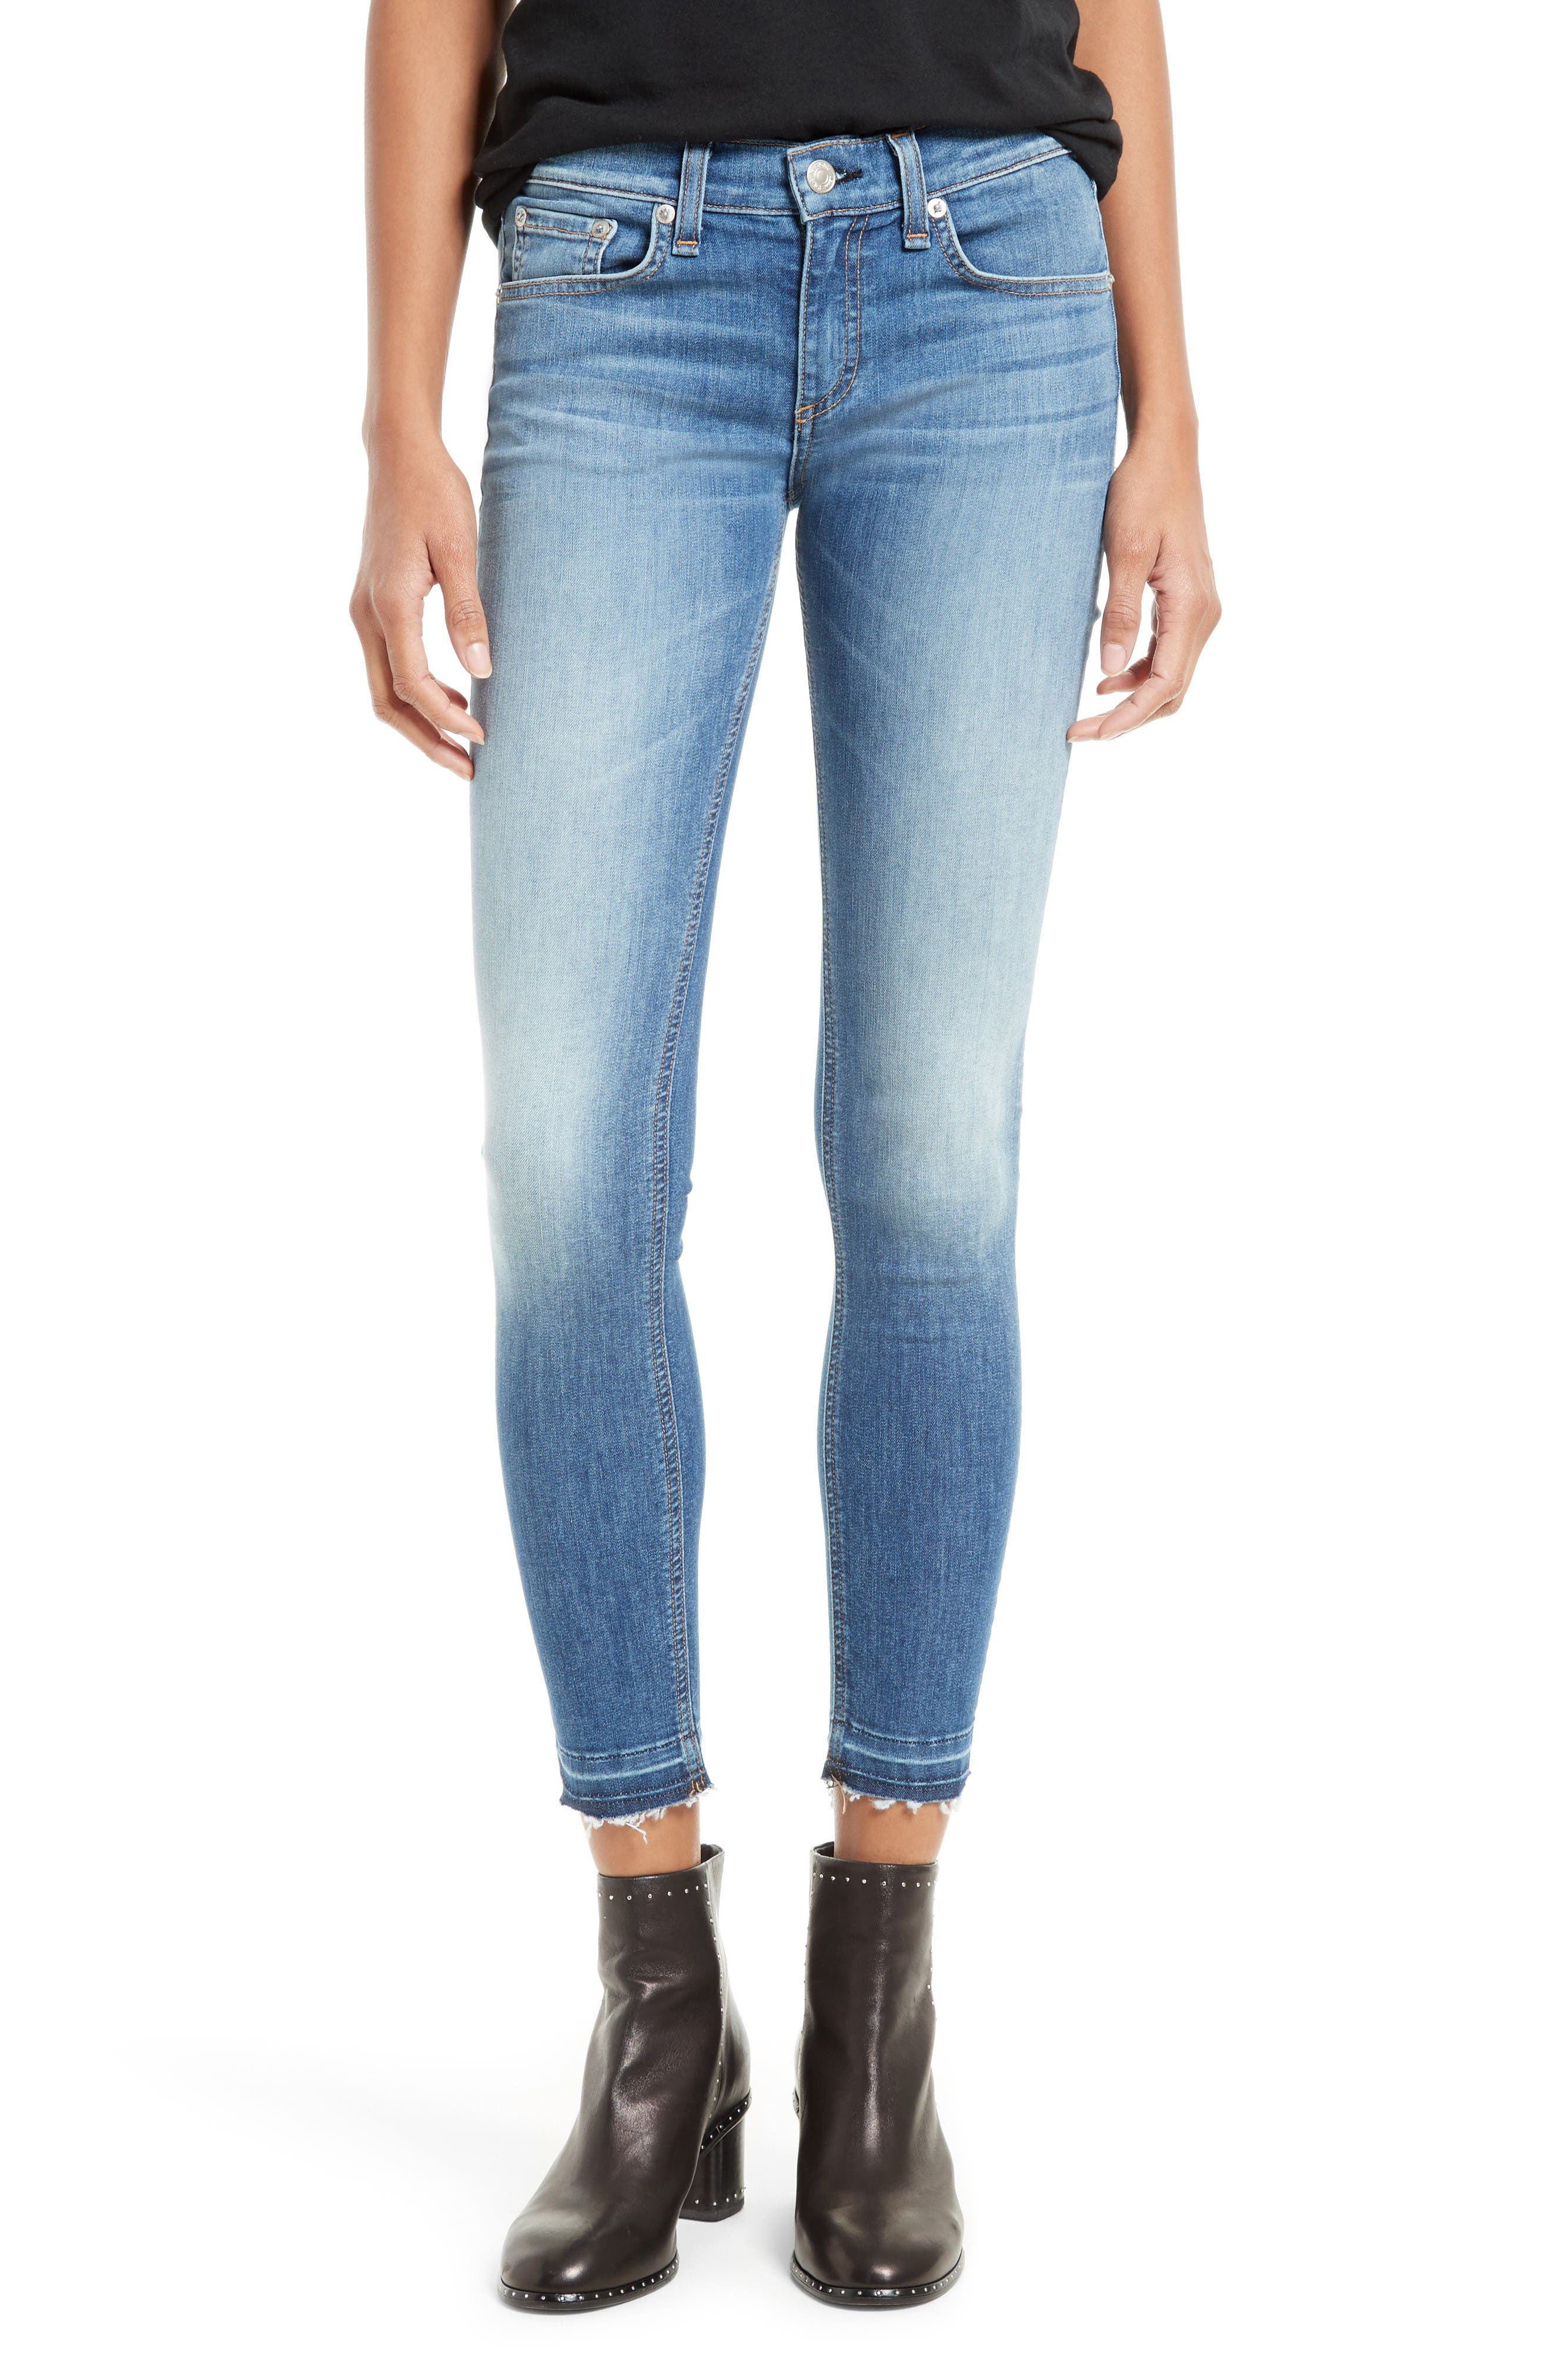 Alternate Image 1 Selected - rag & bone/JEAN Capri Skinny Jeans (Clean Lilly Dale)